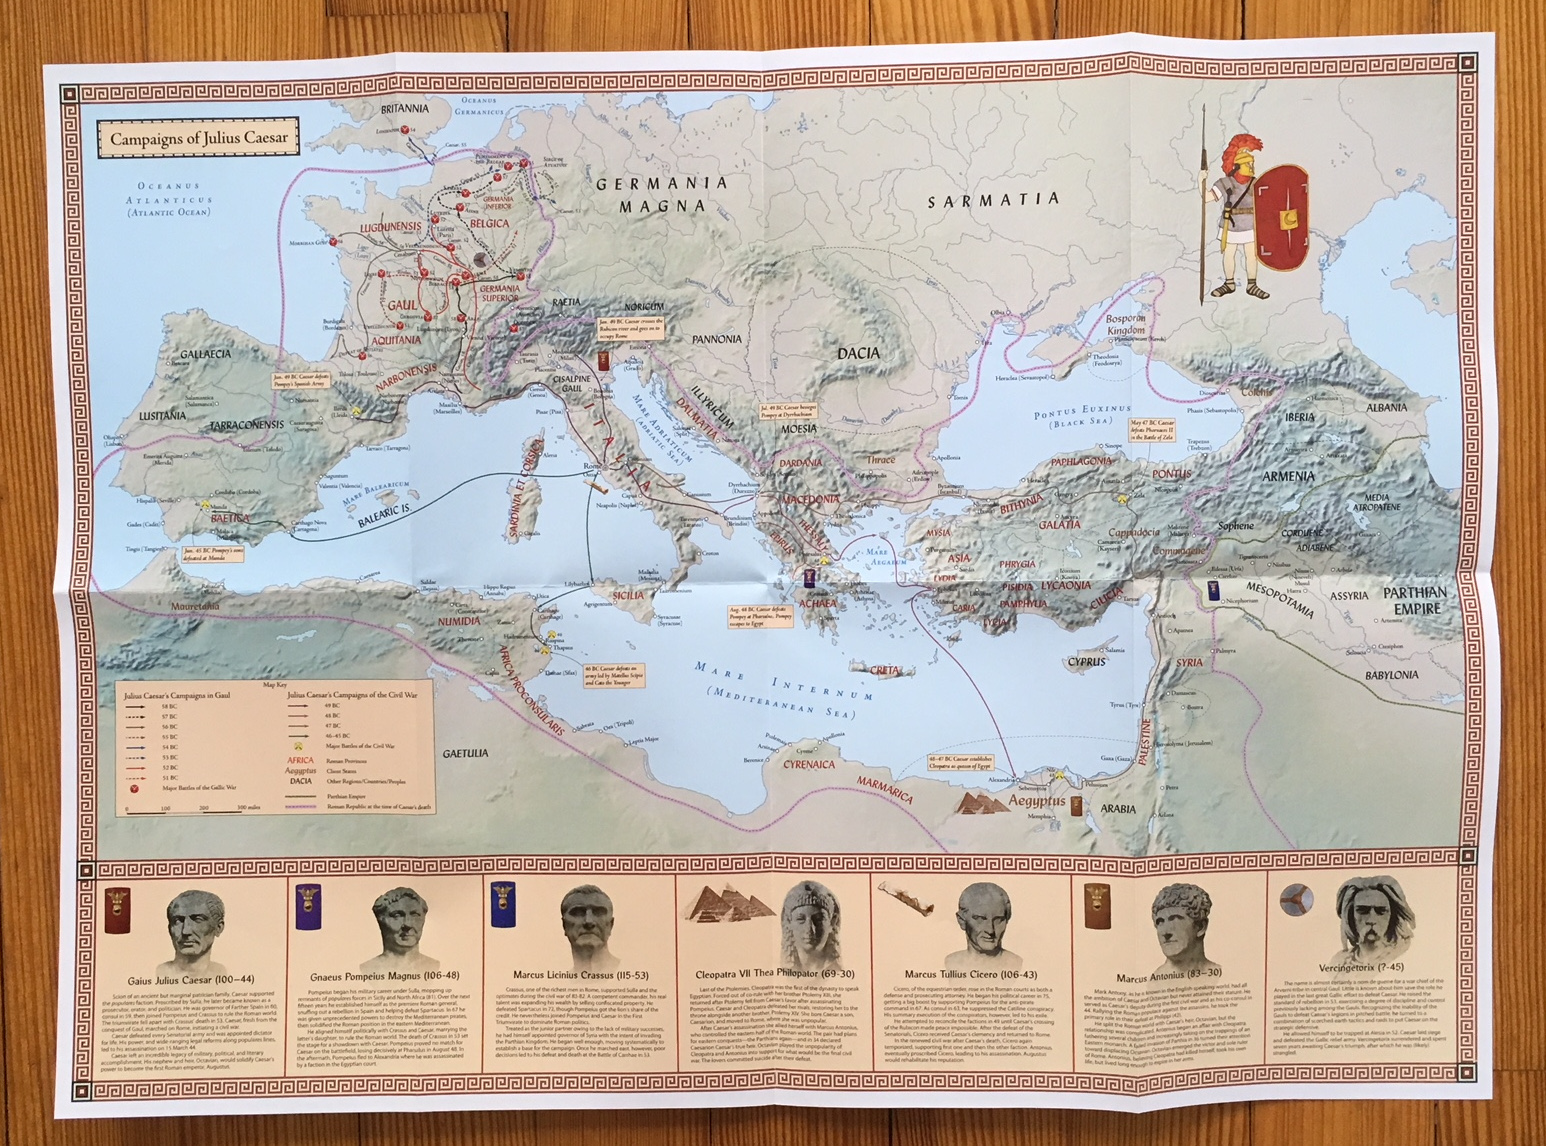 Strategy & Tactics - Quarterly - 1 - Caesar - Veni Vidi Vici